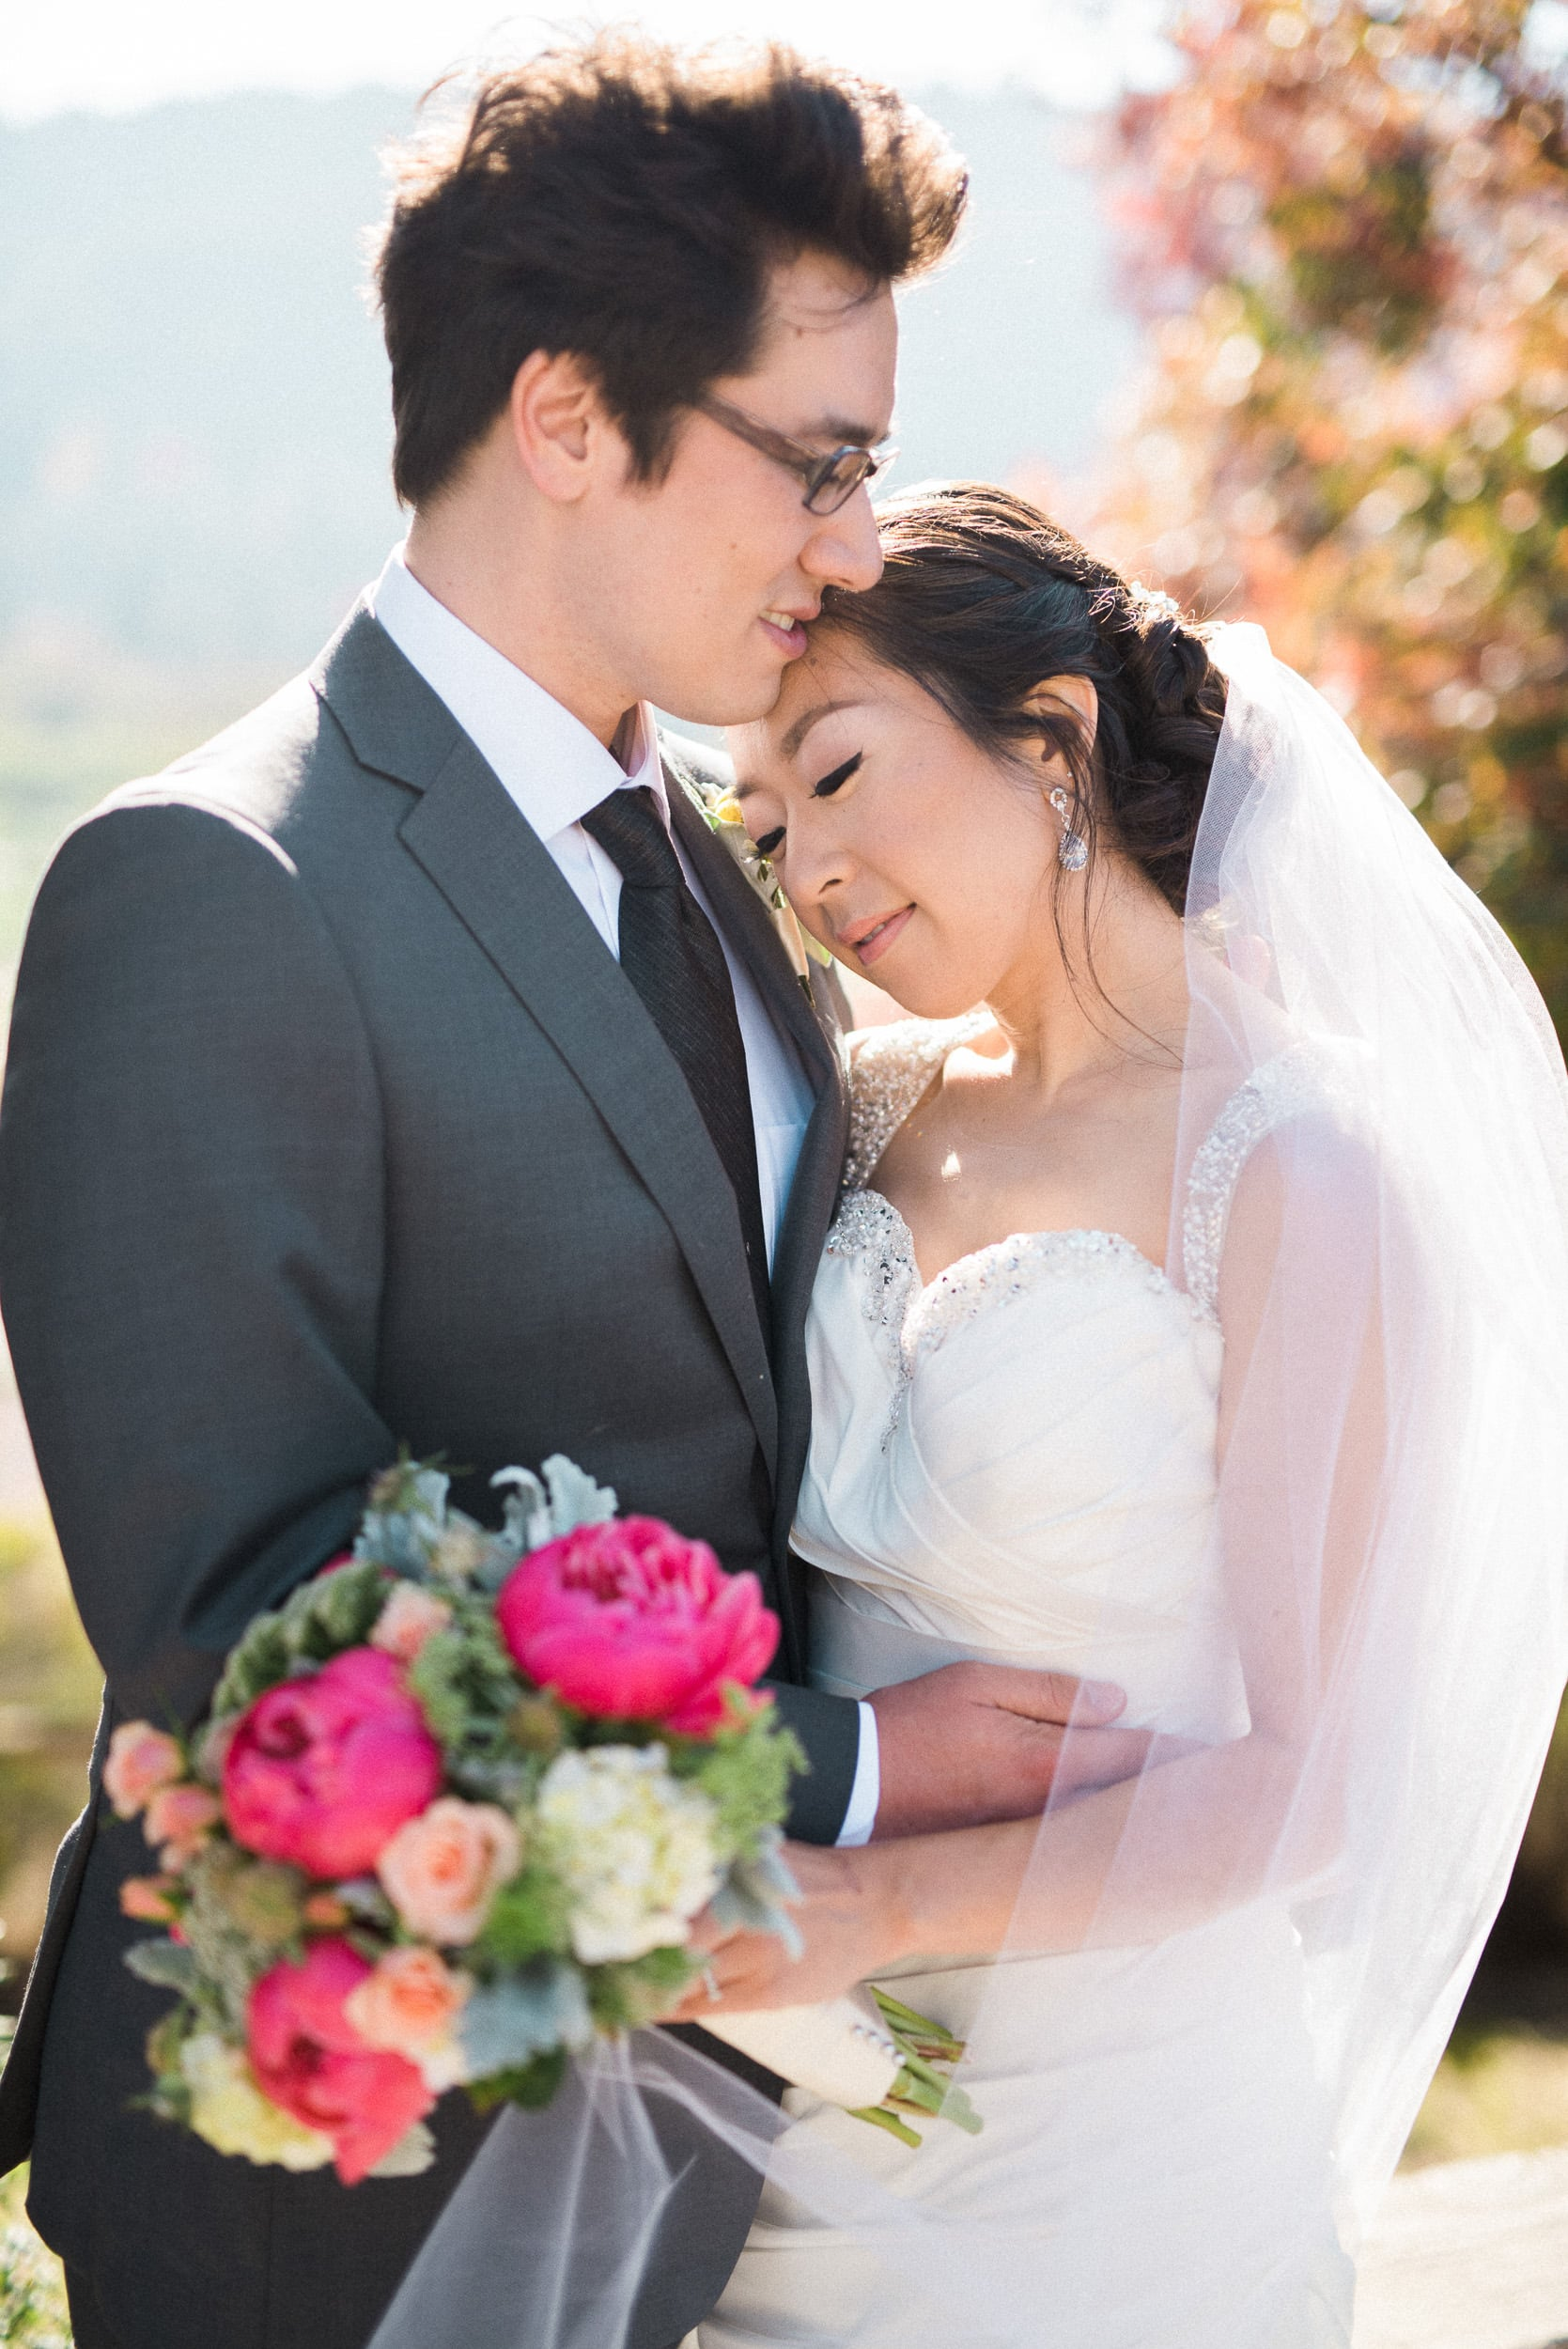 Moraga Valley Church wedding 015.jpg